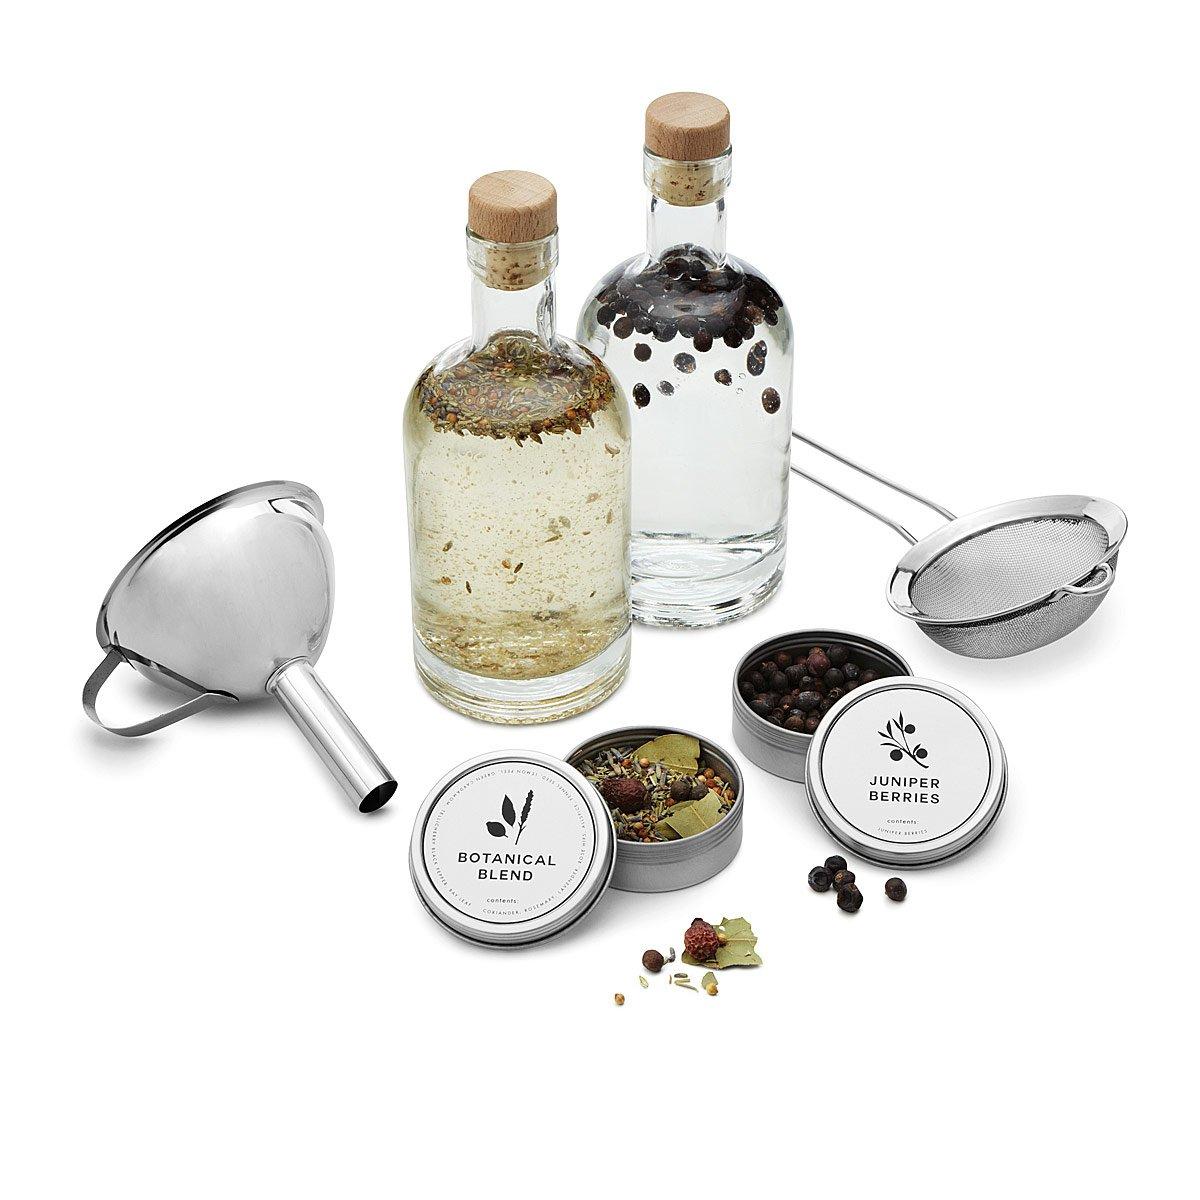 Homemade gin kit make moonshine alcohol your own liquor homemade gin kit 2 thumbnail view life size image fun diy kits solutioingenieria Gallery